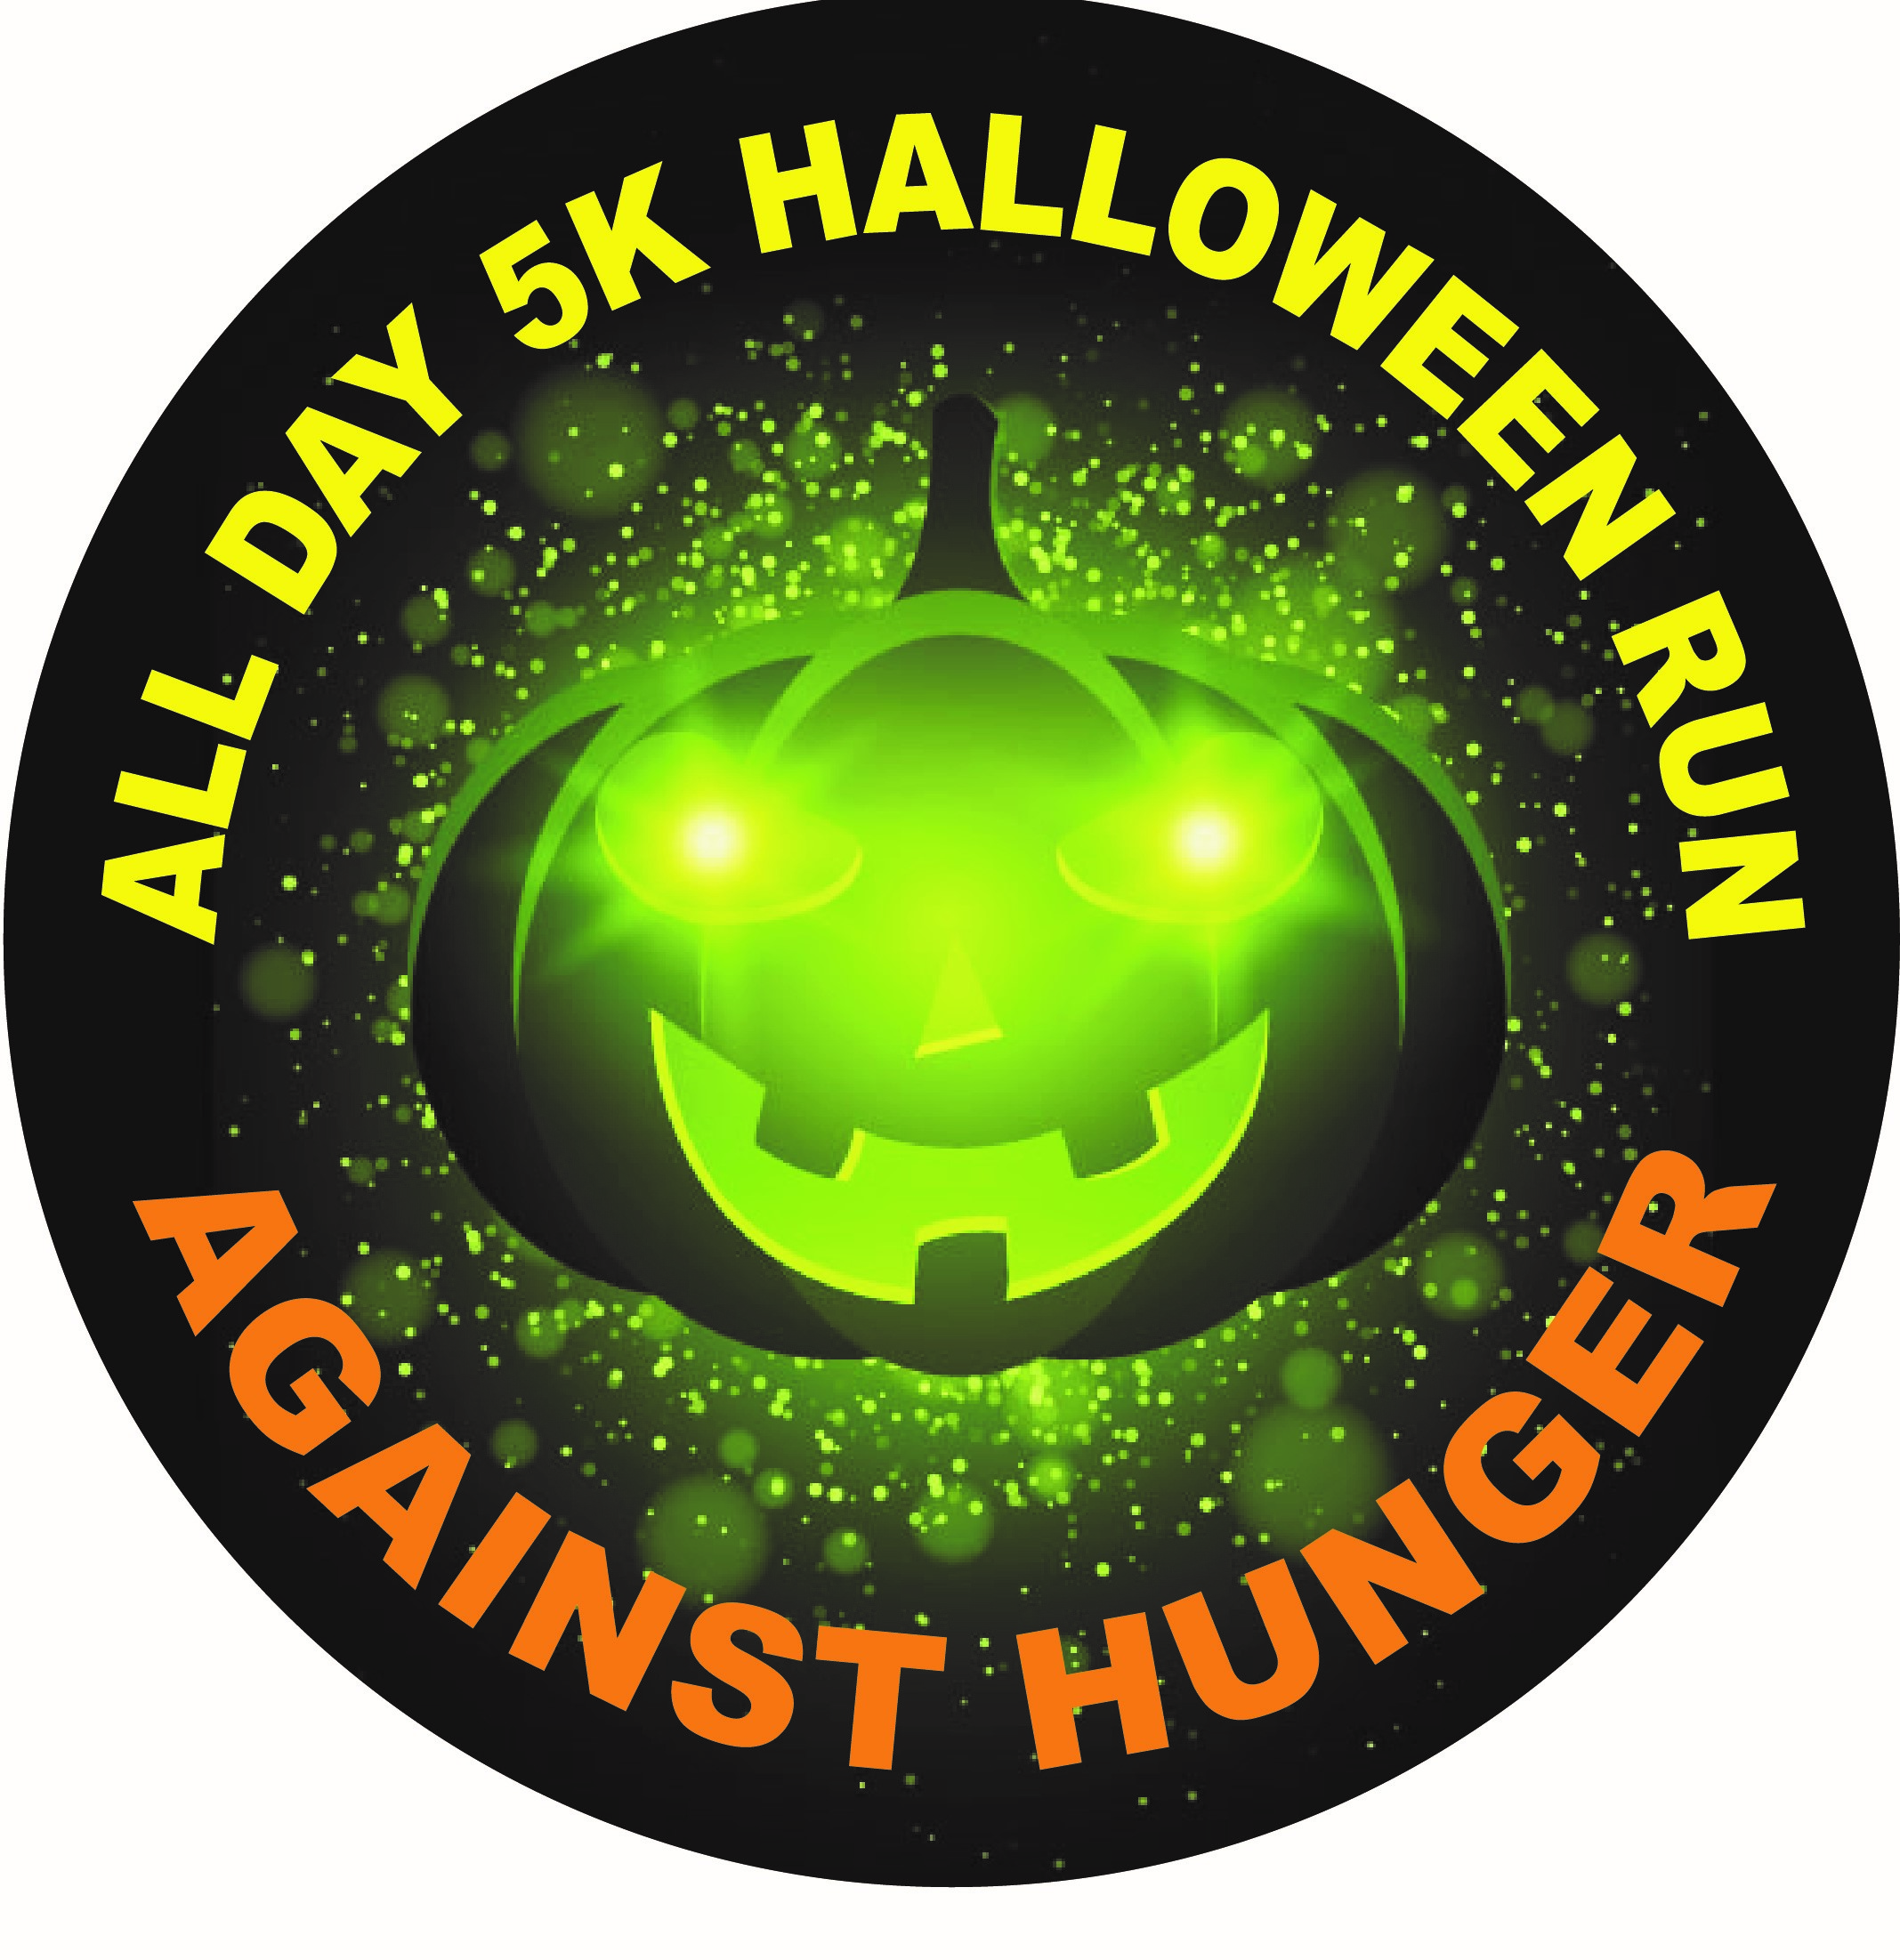 2020 Halloween Run Time All Day 5K Halloween Run Against Hunger | Eastside Racing Company